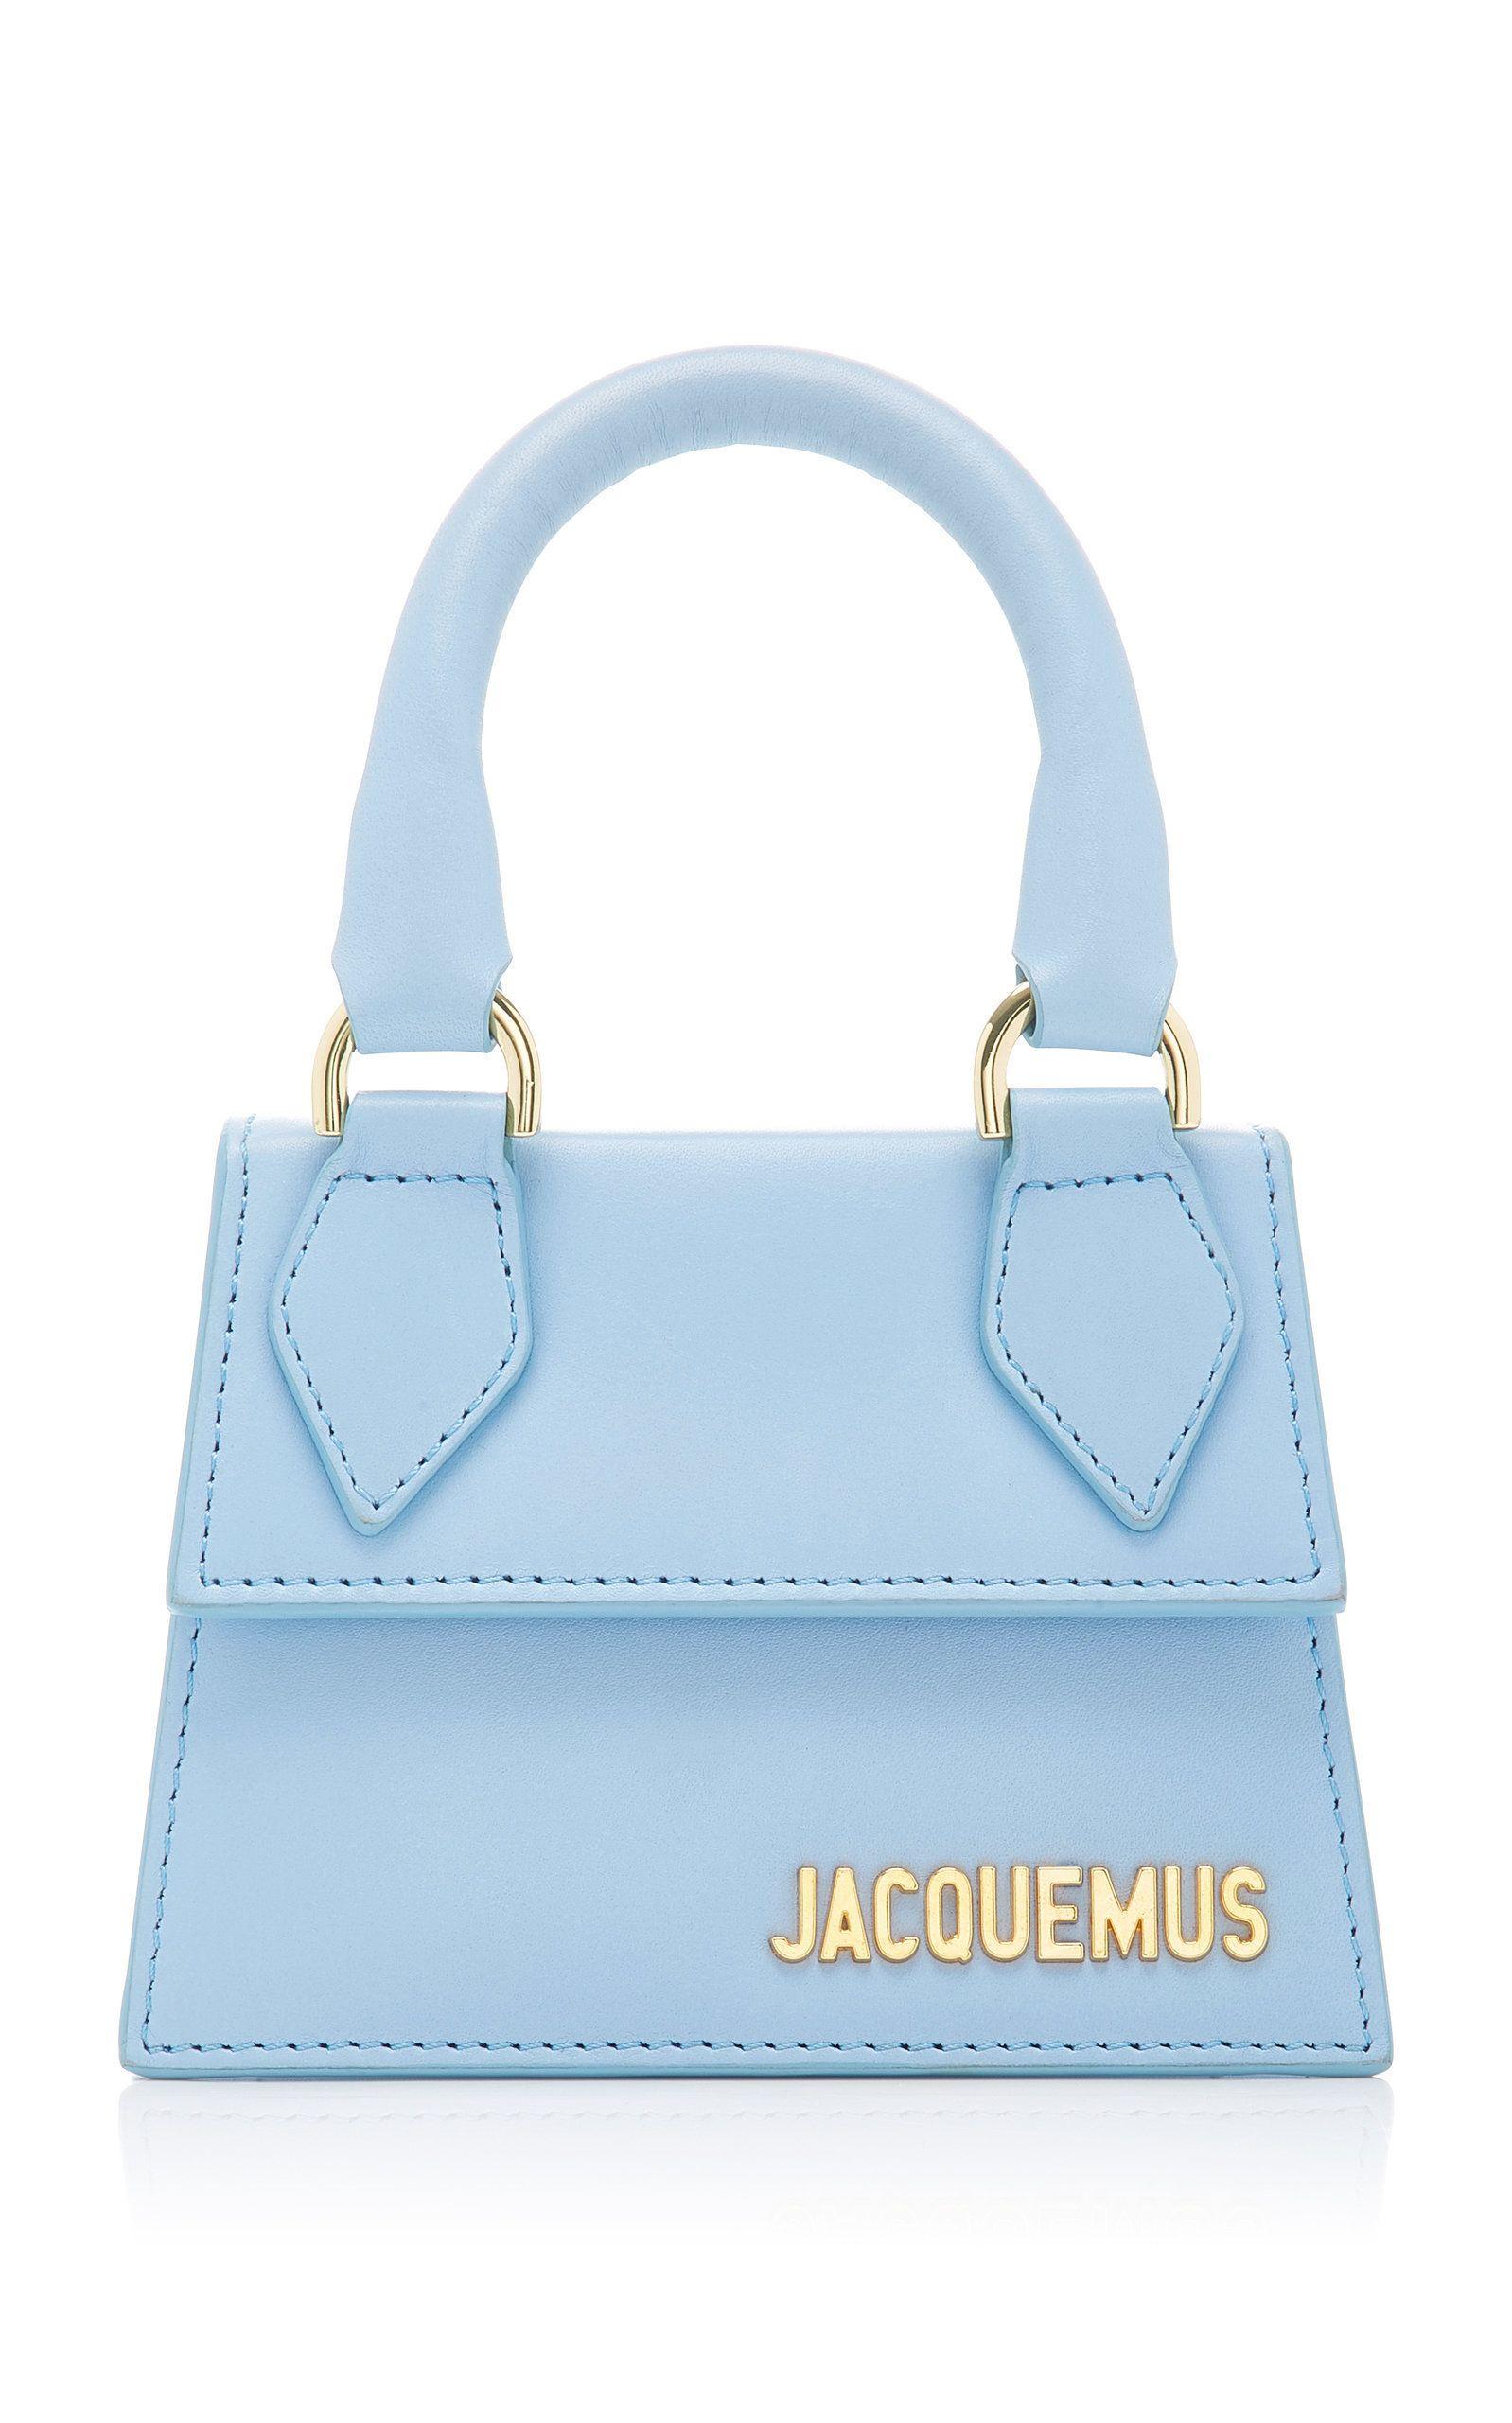 b8fedc56846 Jacquemus Le Chiquita Leather Micro Bag   KABELKY   HANDBAGS   BAGS ...